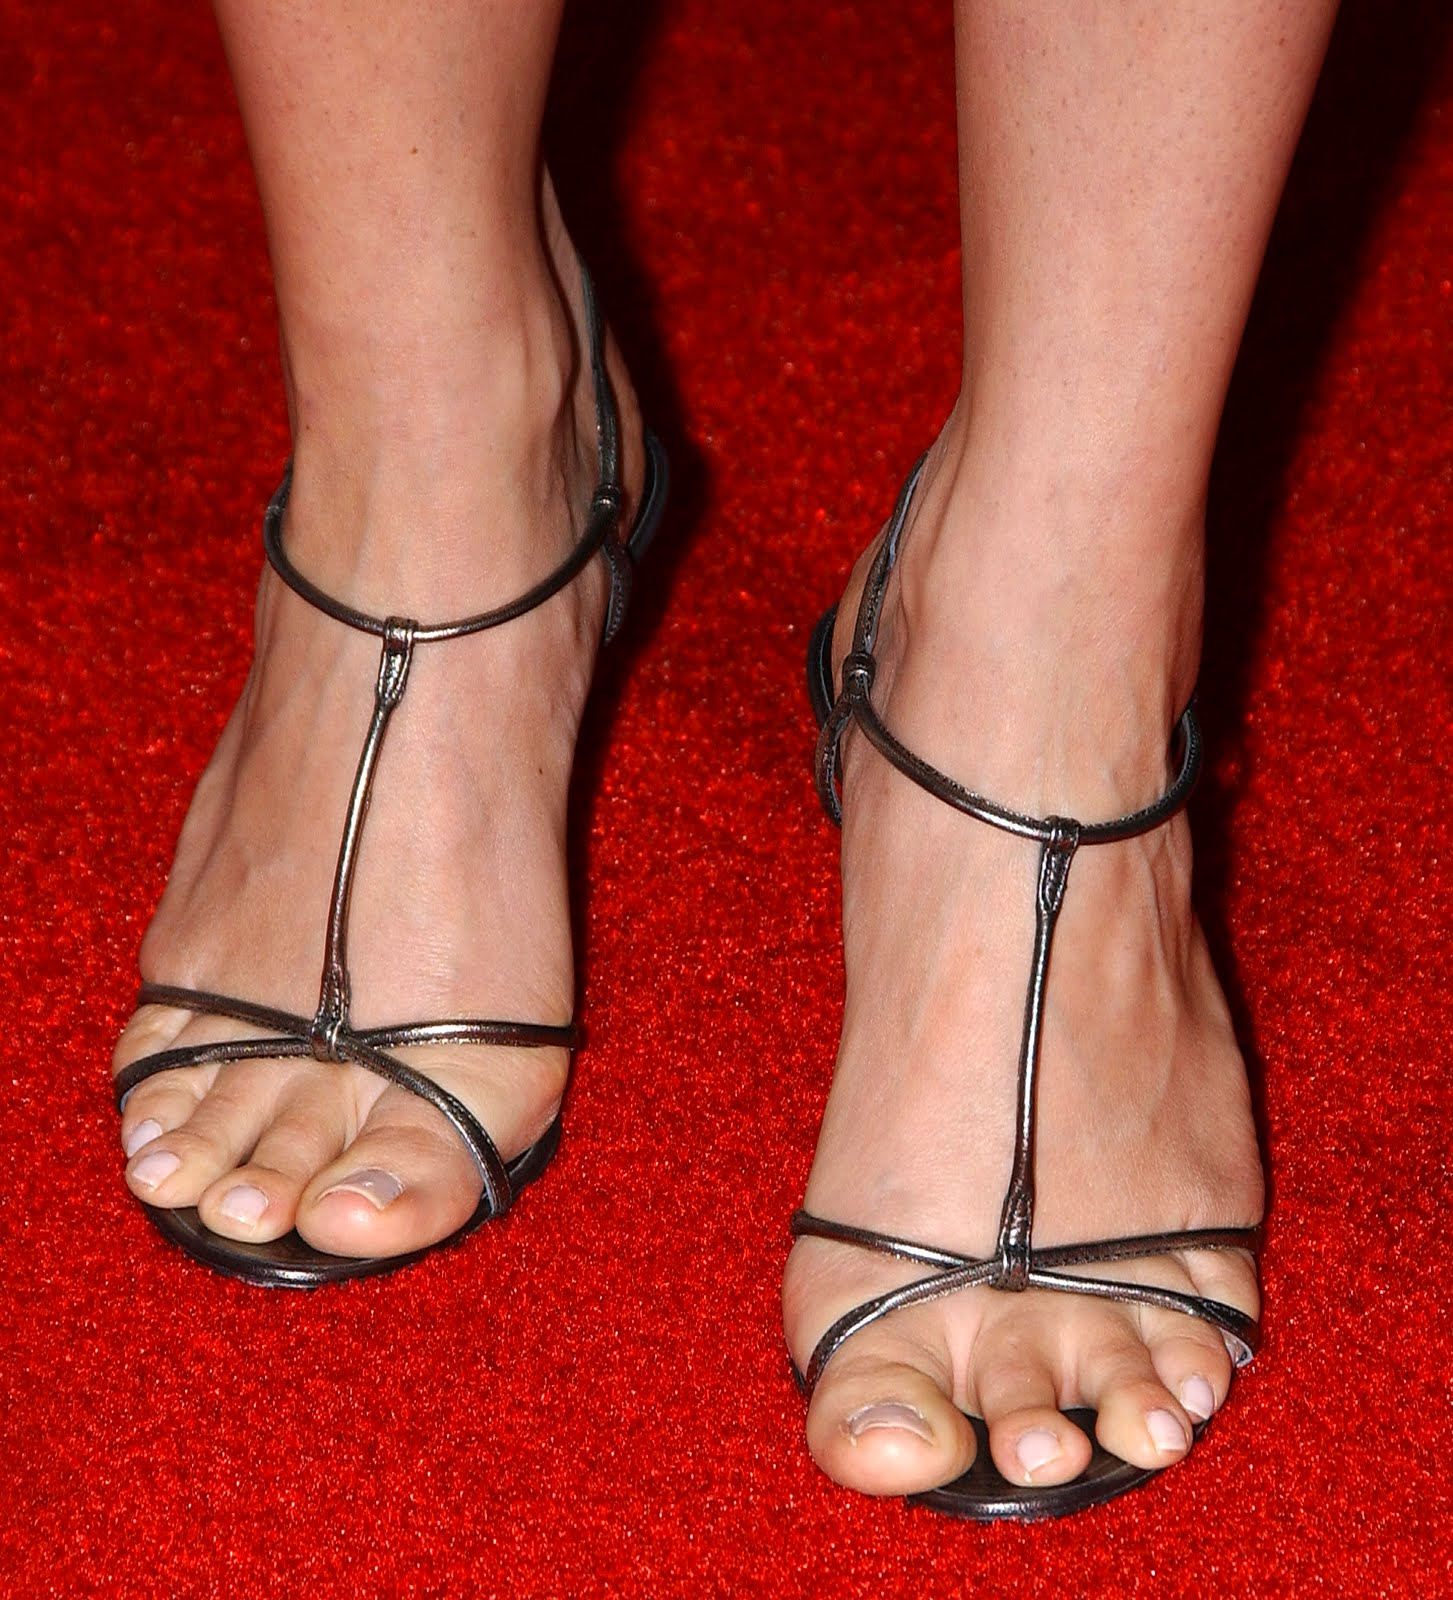 Megyn Kelly Legs And Feet - newhairstylesformen2014.com